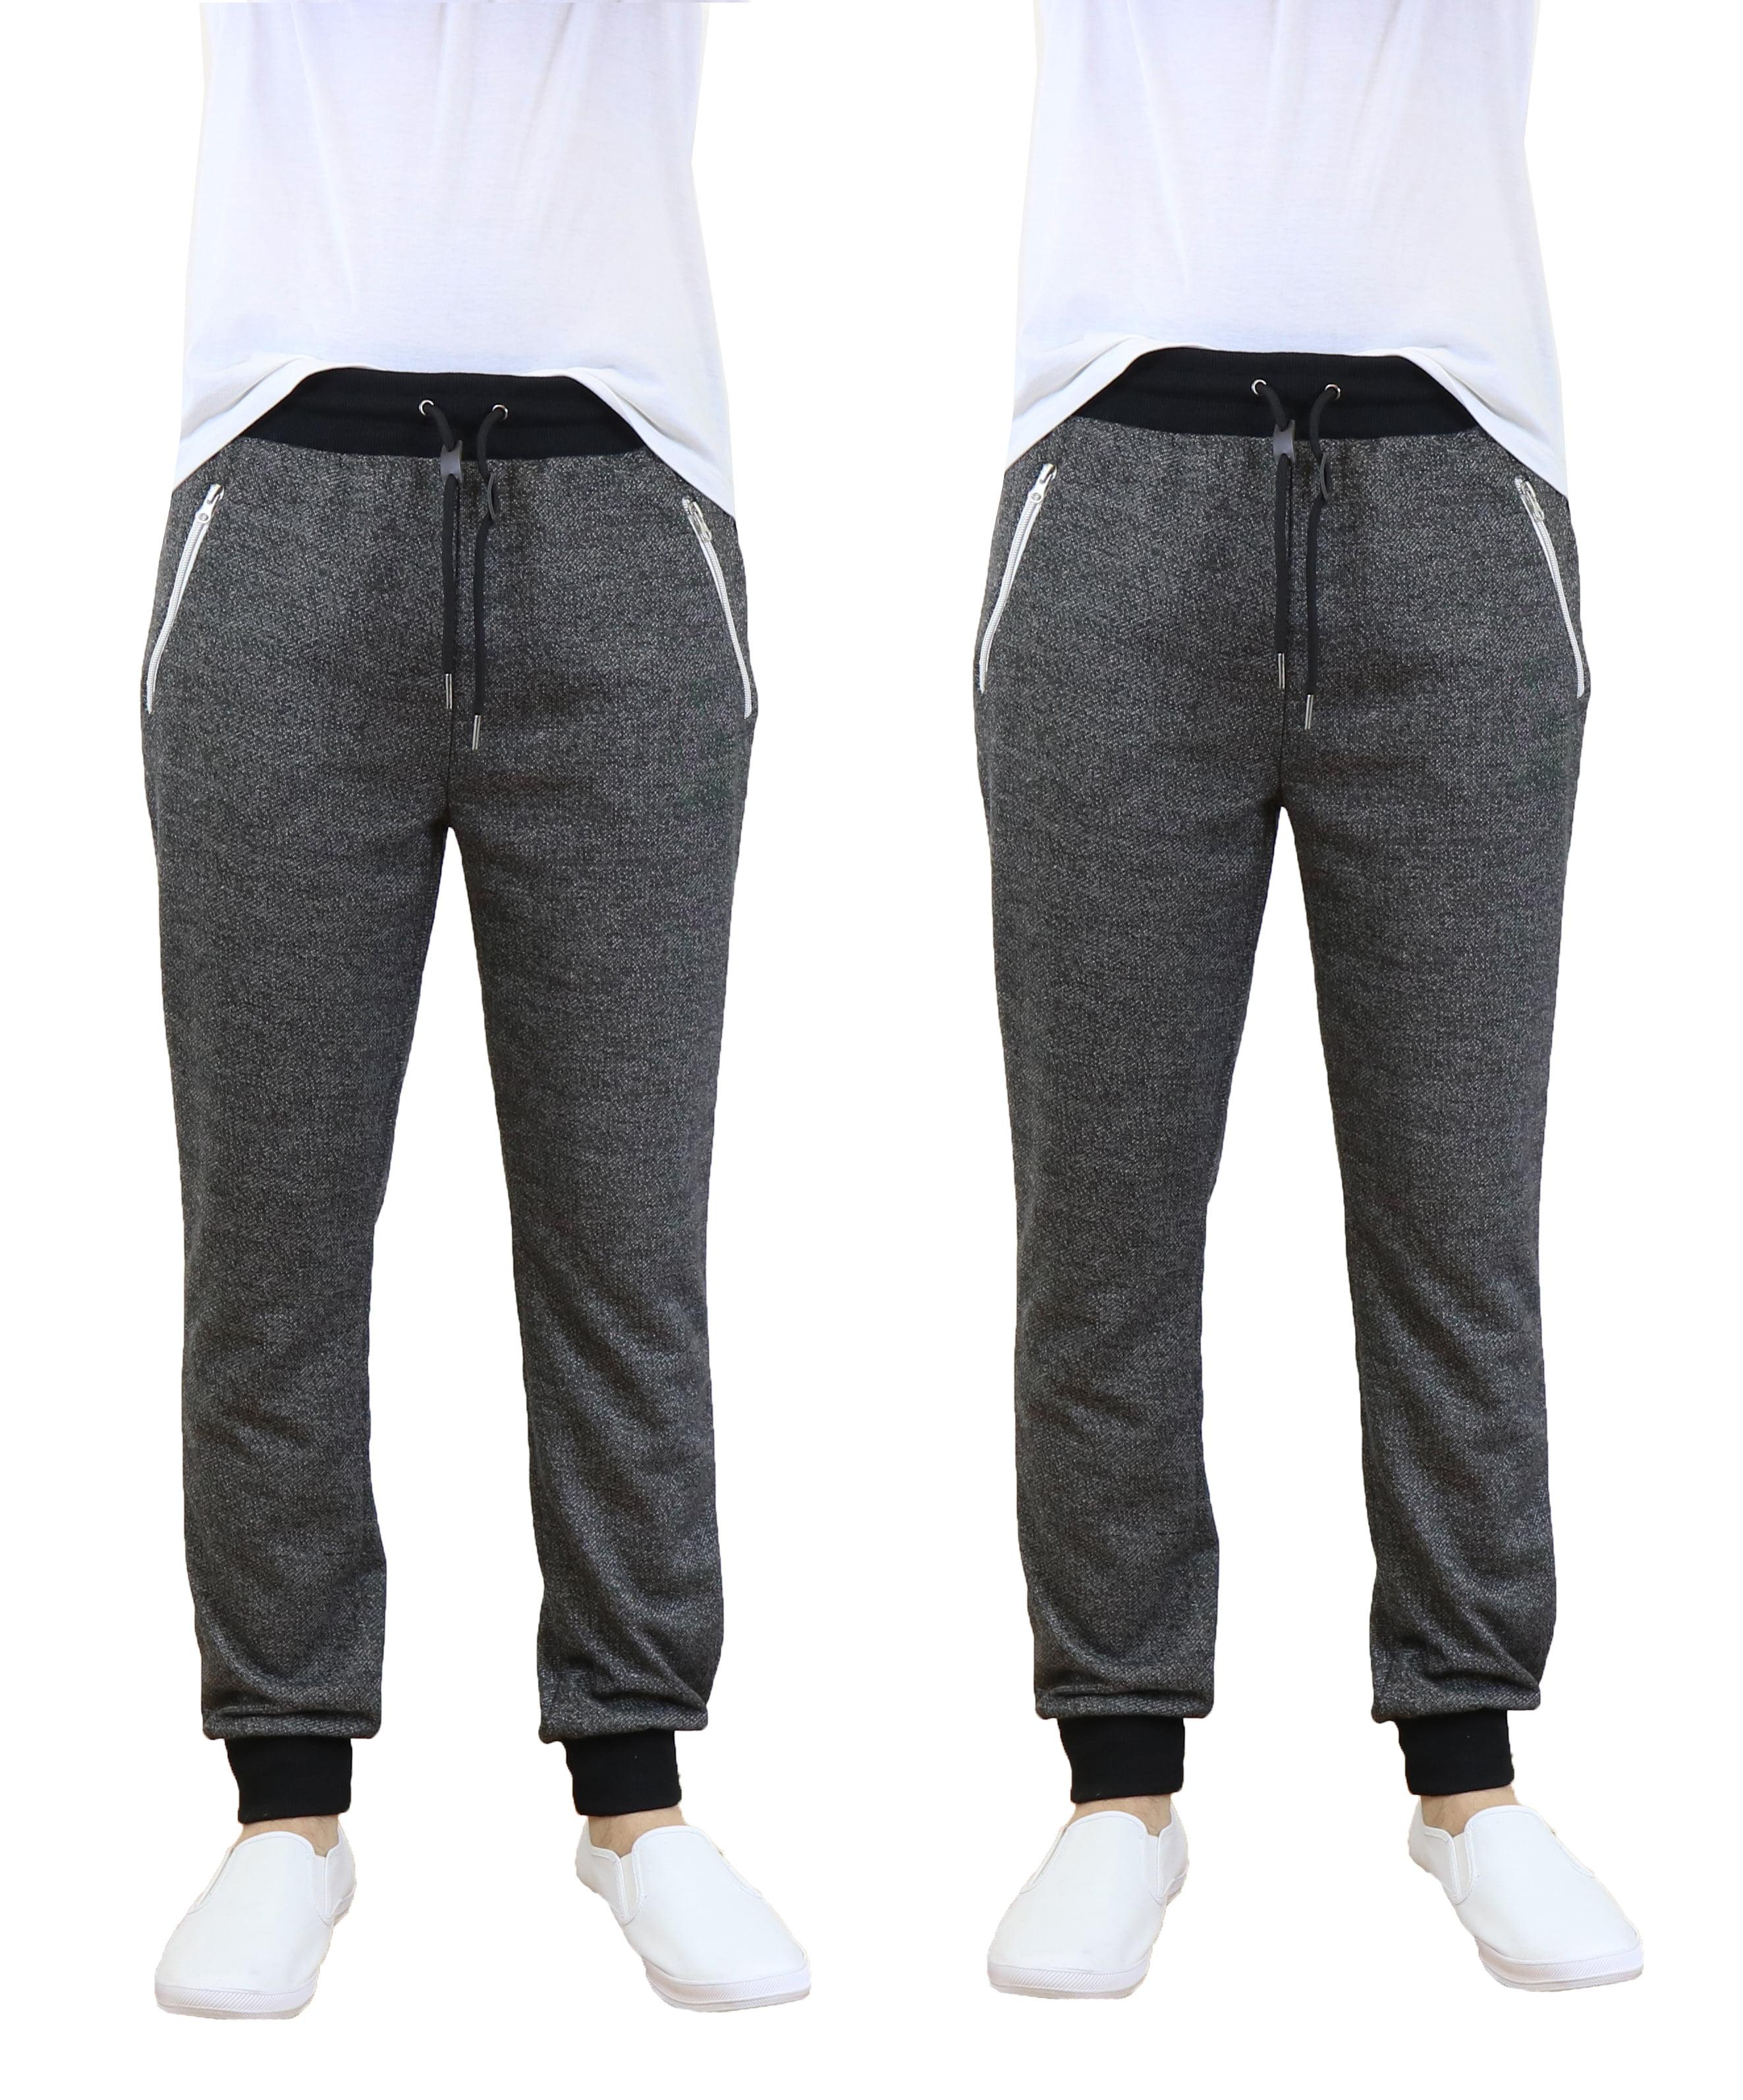 Men's Jogger Sweatpants With Zipper Pockets (2-Pack)